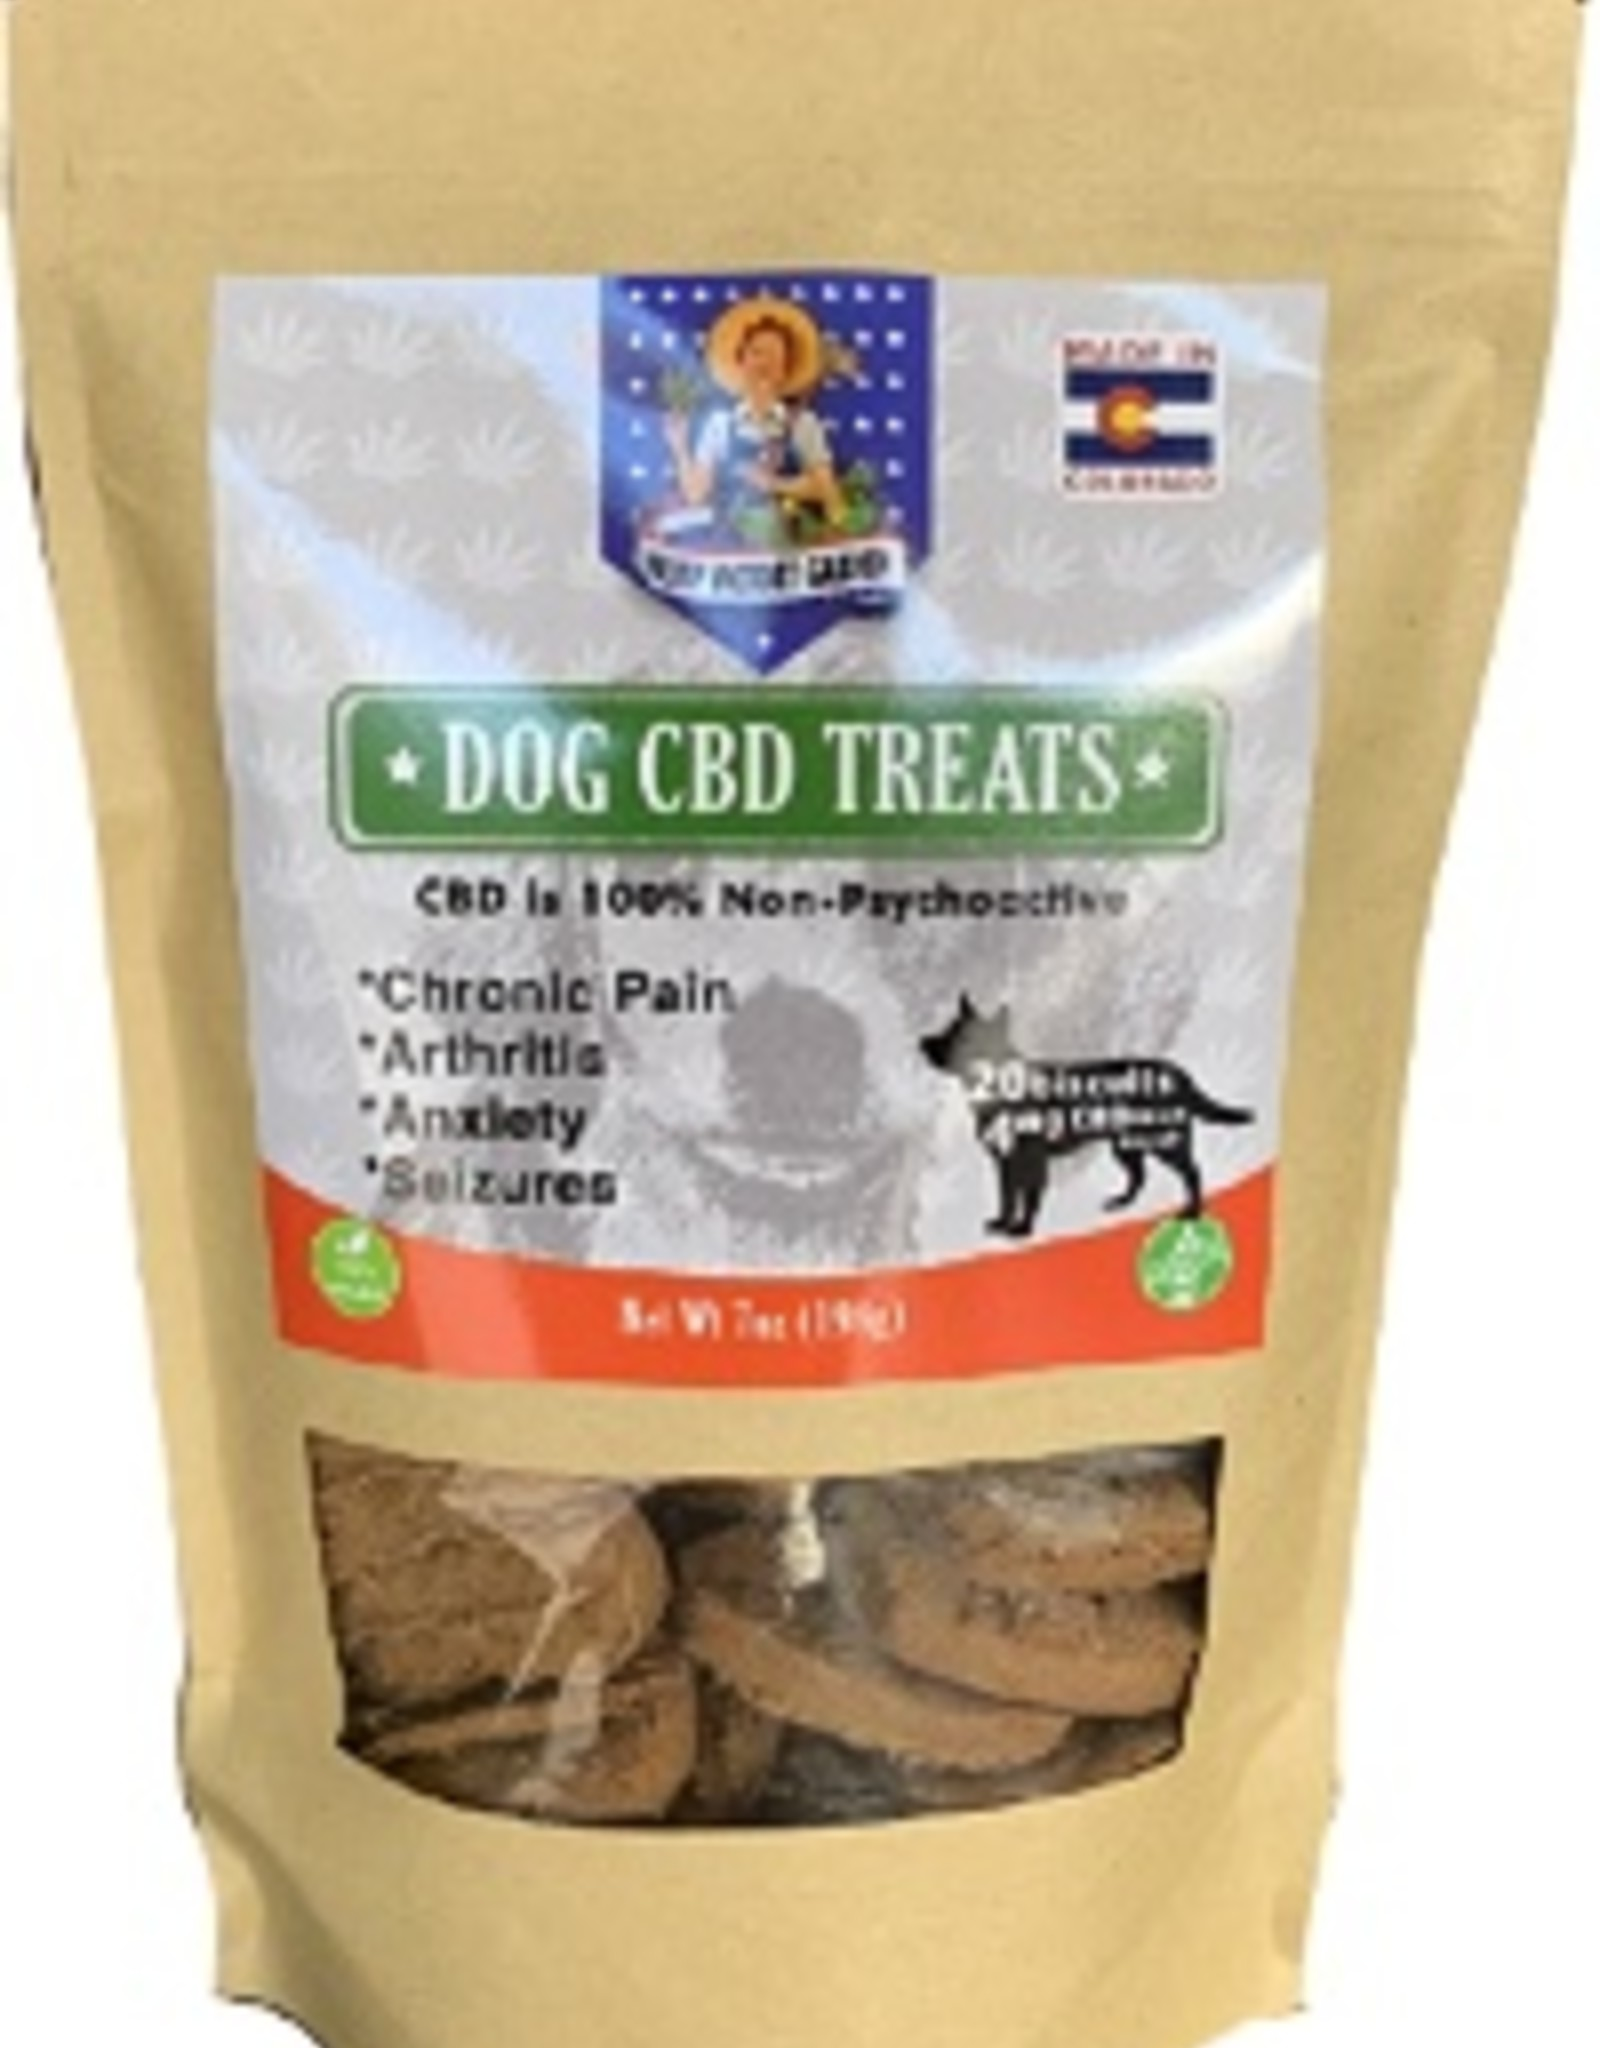 Hemp Victory Garden Dog CBD Treats